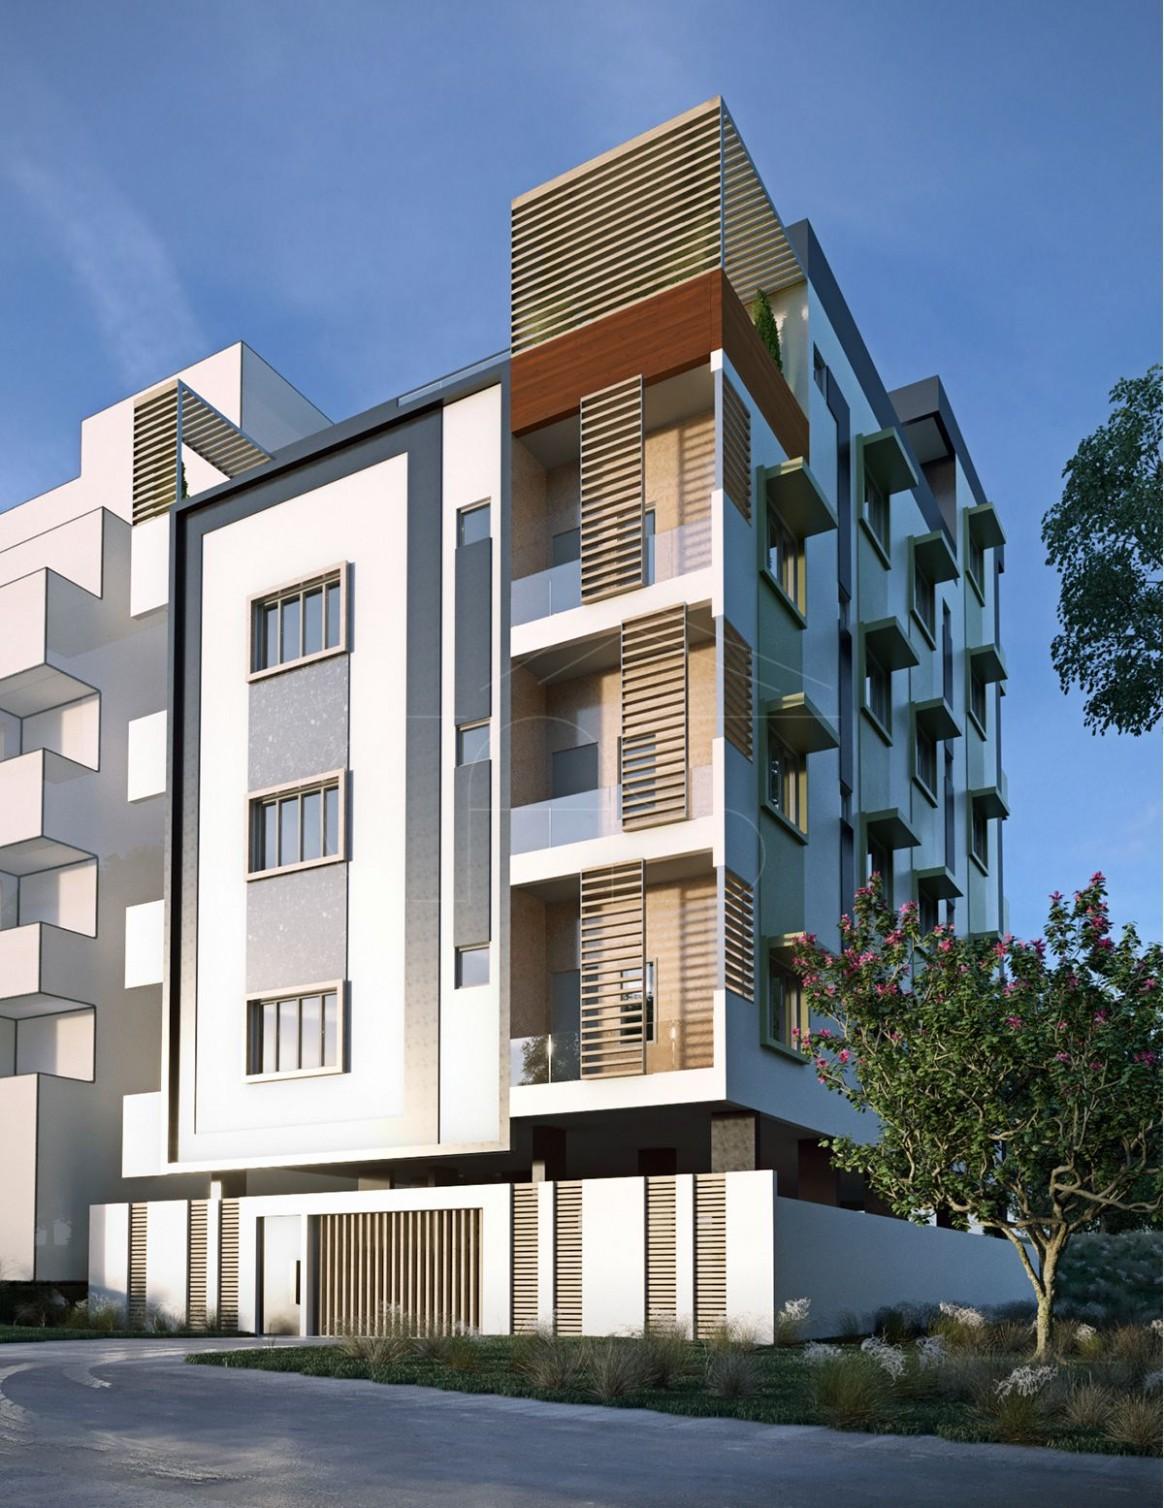 Modern Apartment Exterior Design - Bengaluru, India  Bina - Apartment Exterior Design India